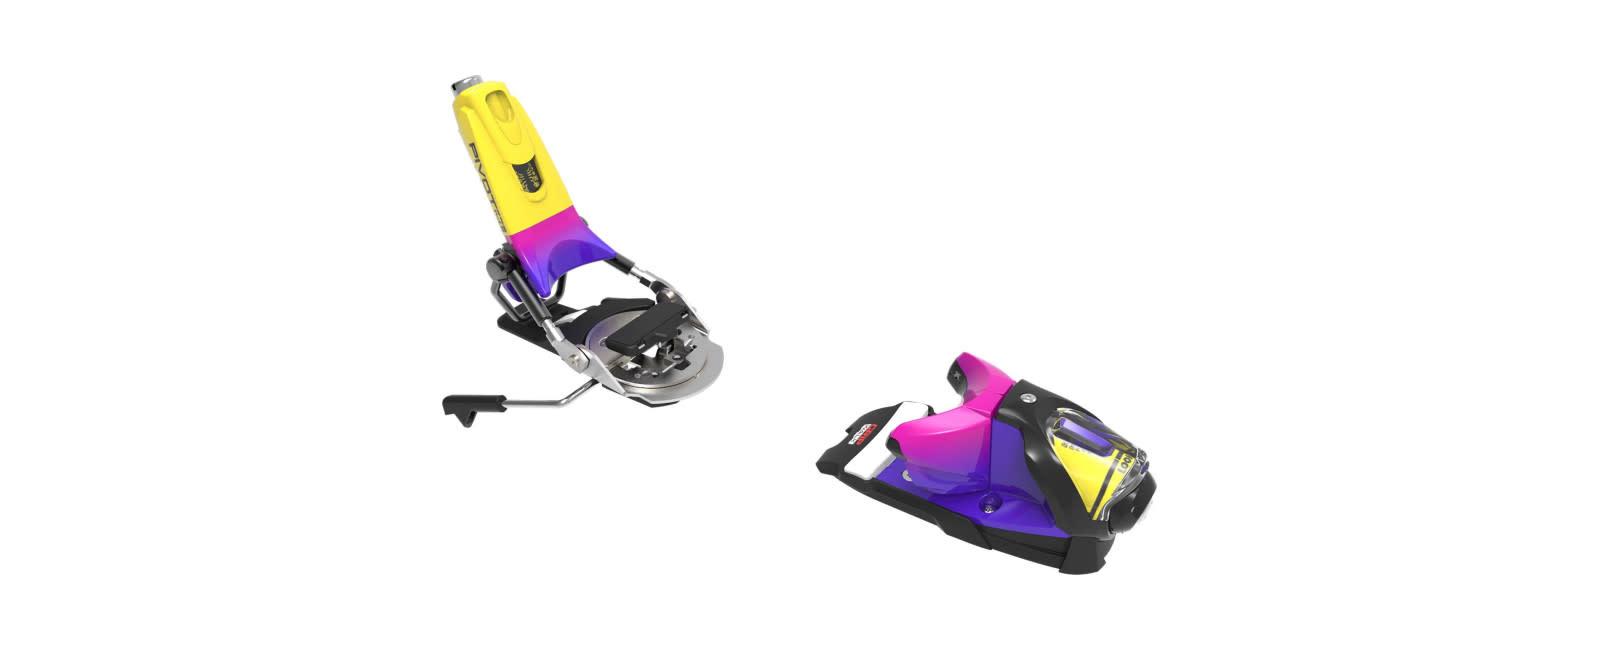 LOOK Look Pivot 14 GW Ski Binding (2021)